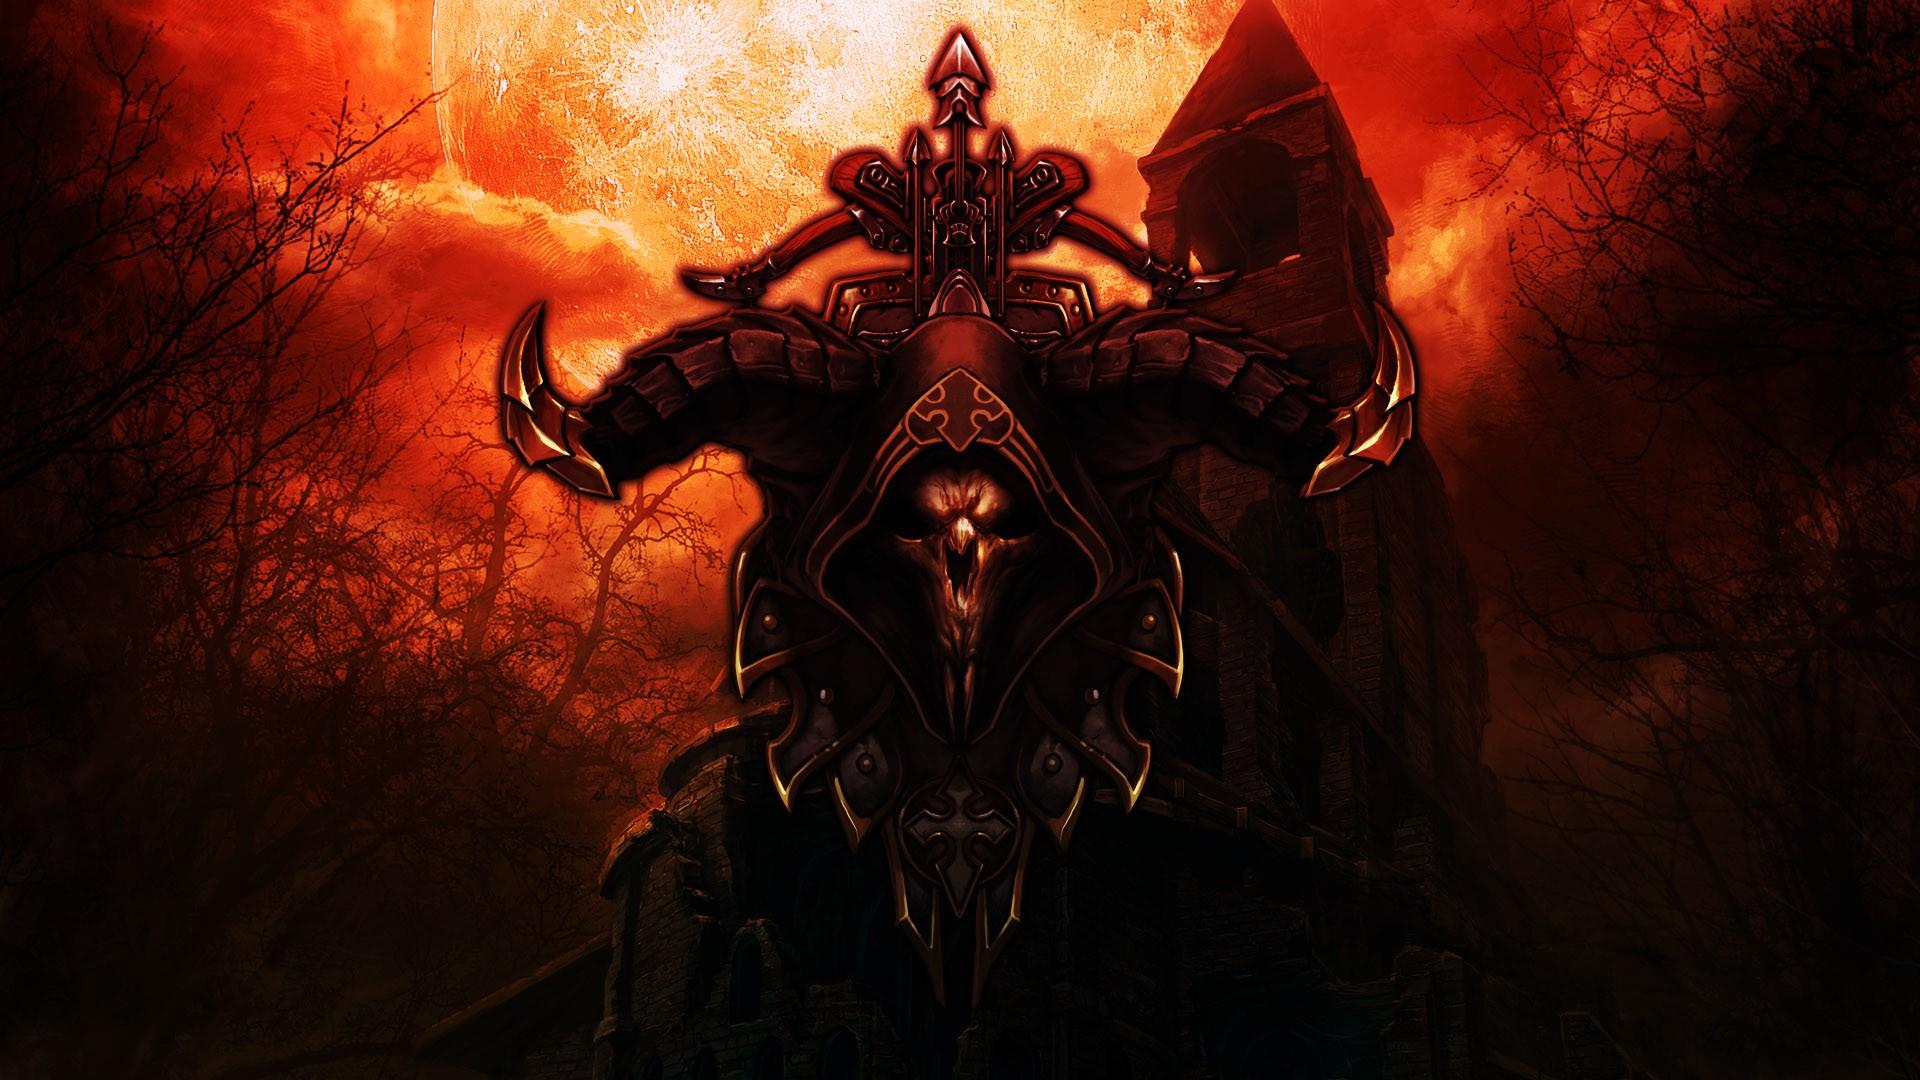 Wallpaper Demon Diablo Iii Person Mythology Demon Hunter